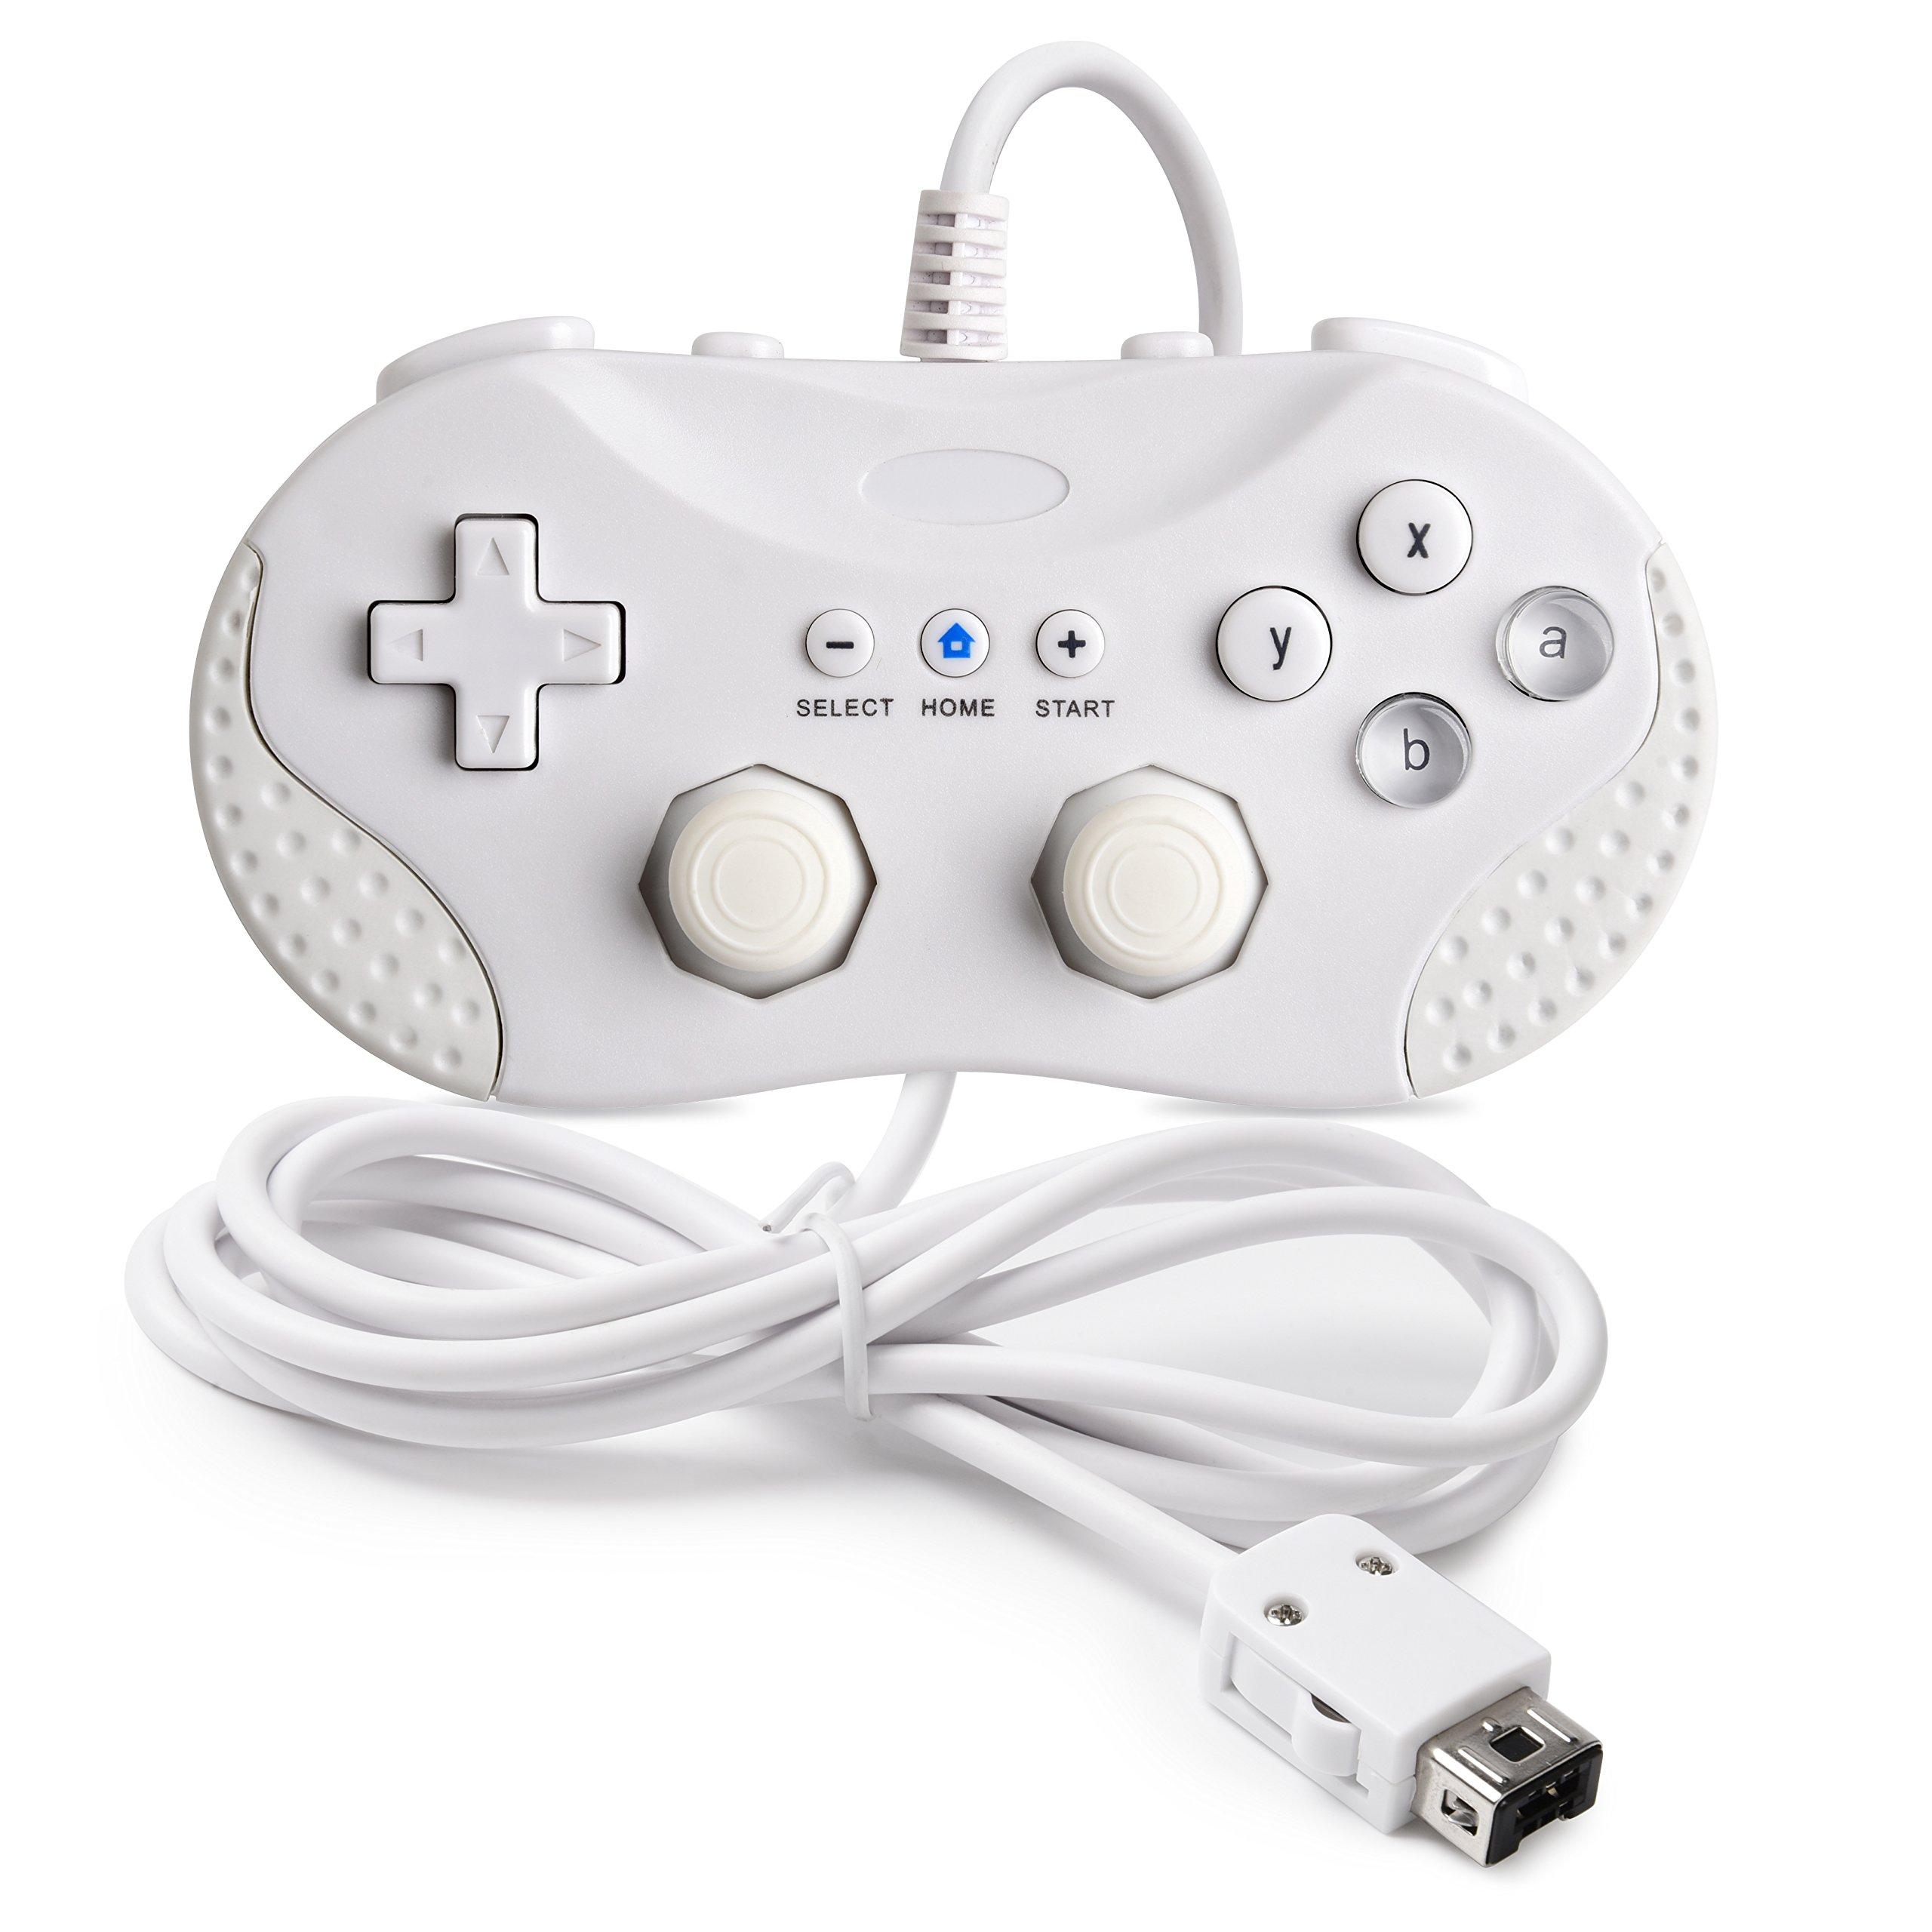 iNNEXT Classic Controller for Nintendo Wii / Wii U / NES Classic Edition (NES Mini), Classic Console Gamepad Gaming Pad Joypad for Nintendo Wii Wii U (White)